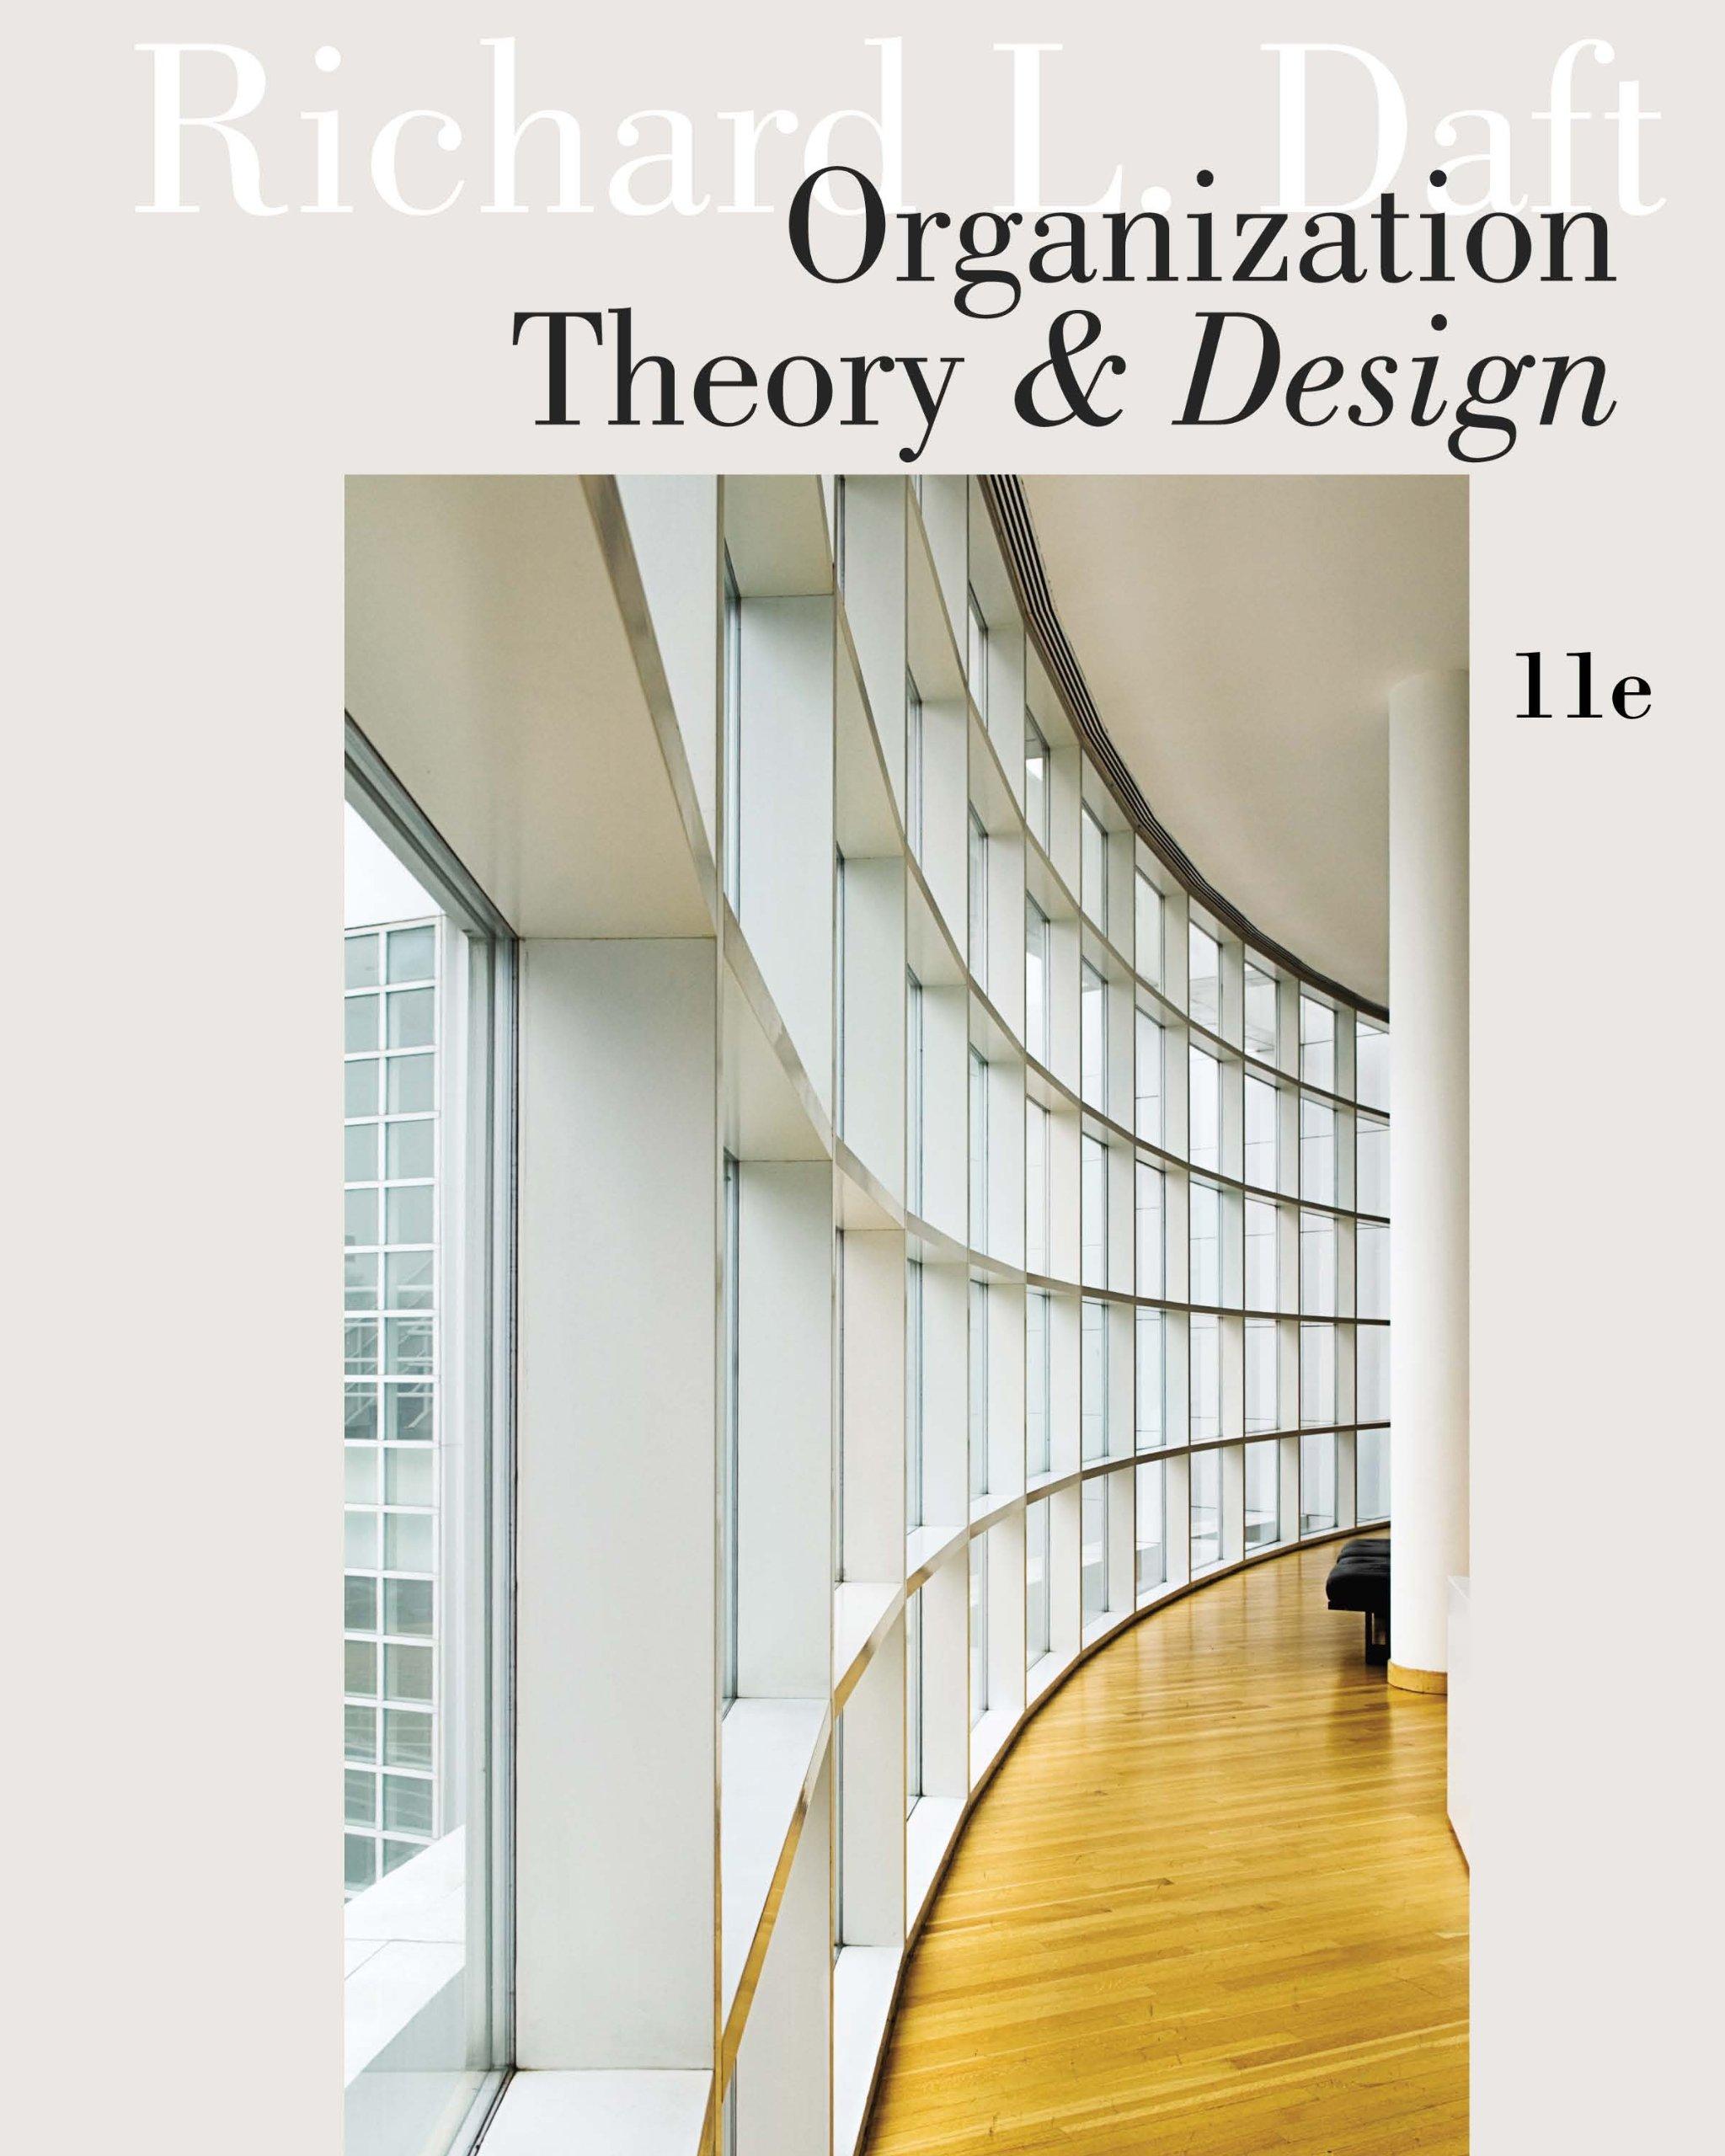 Amazon Com Organization Theory And Design Ebook Daft Richard L Kindle Store